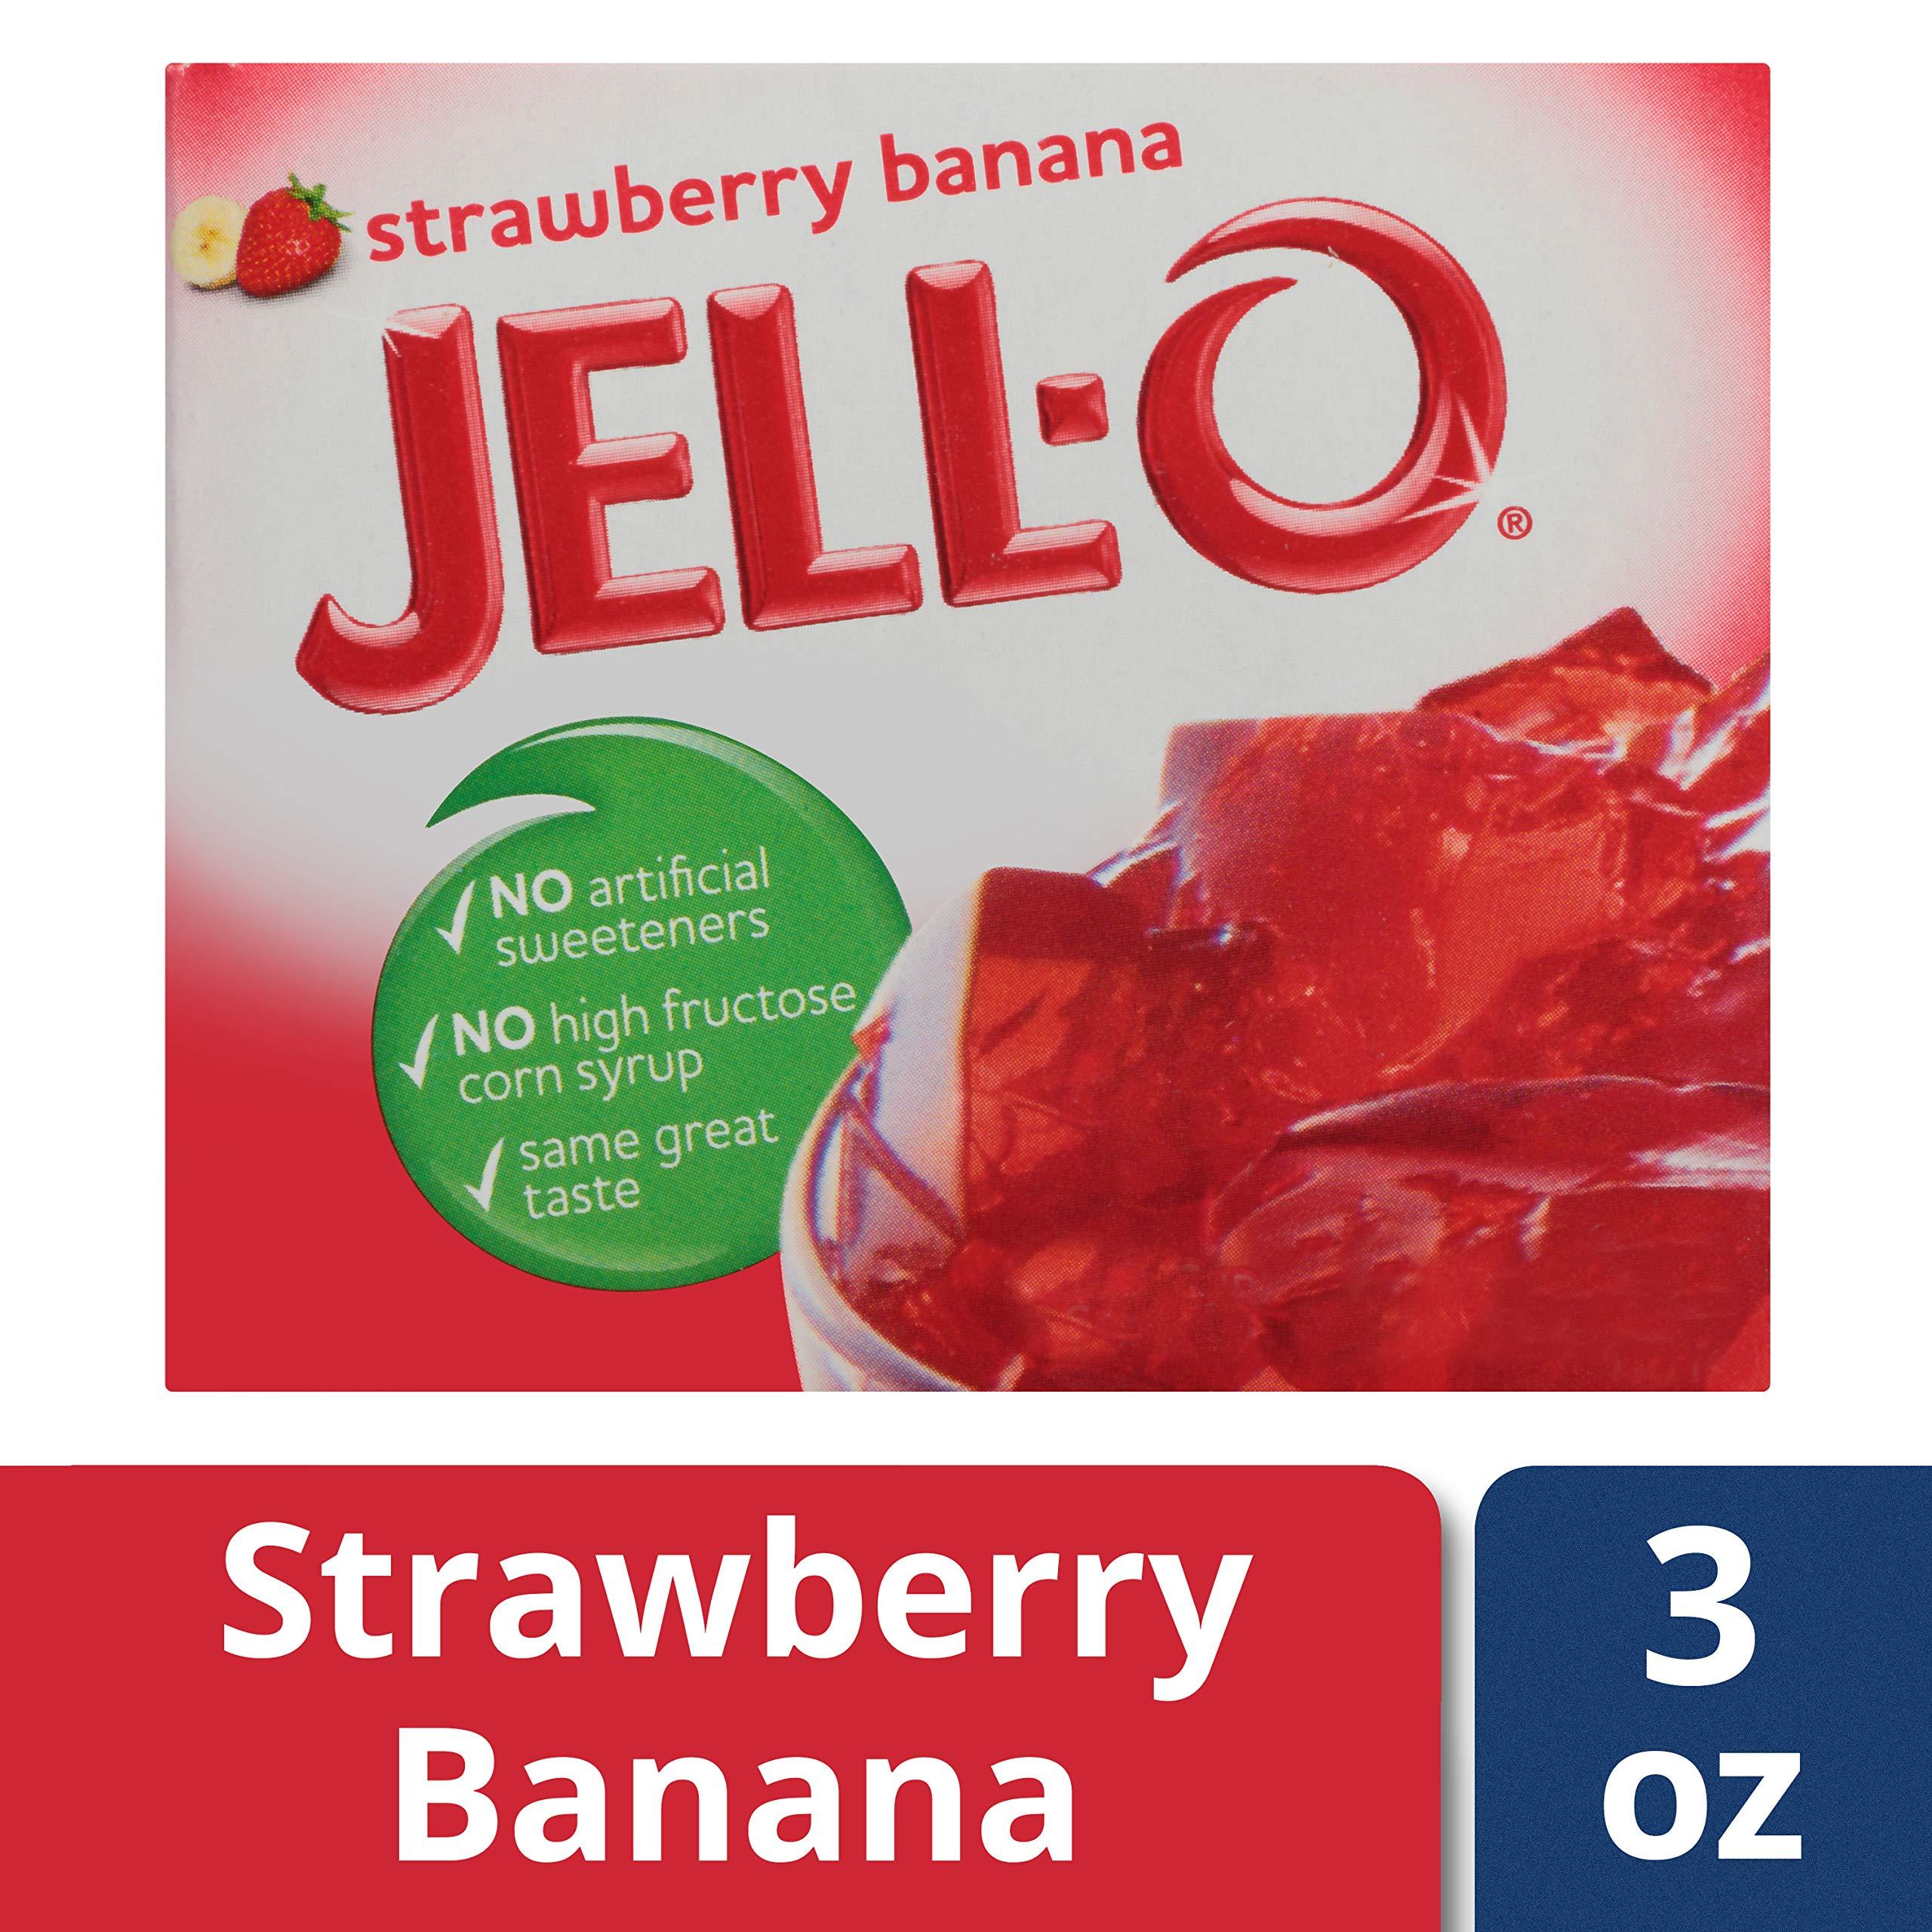 Jell-O Strawberry Banana Gelatin Dessert Mix, 3 oz Box